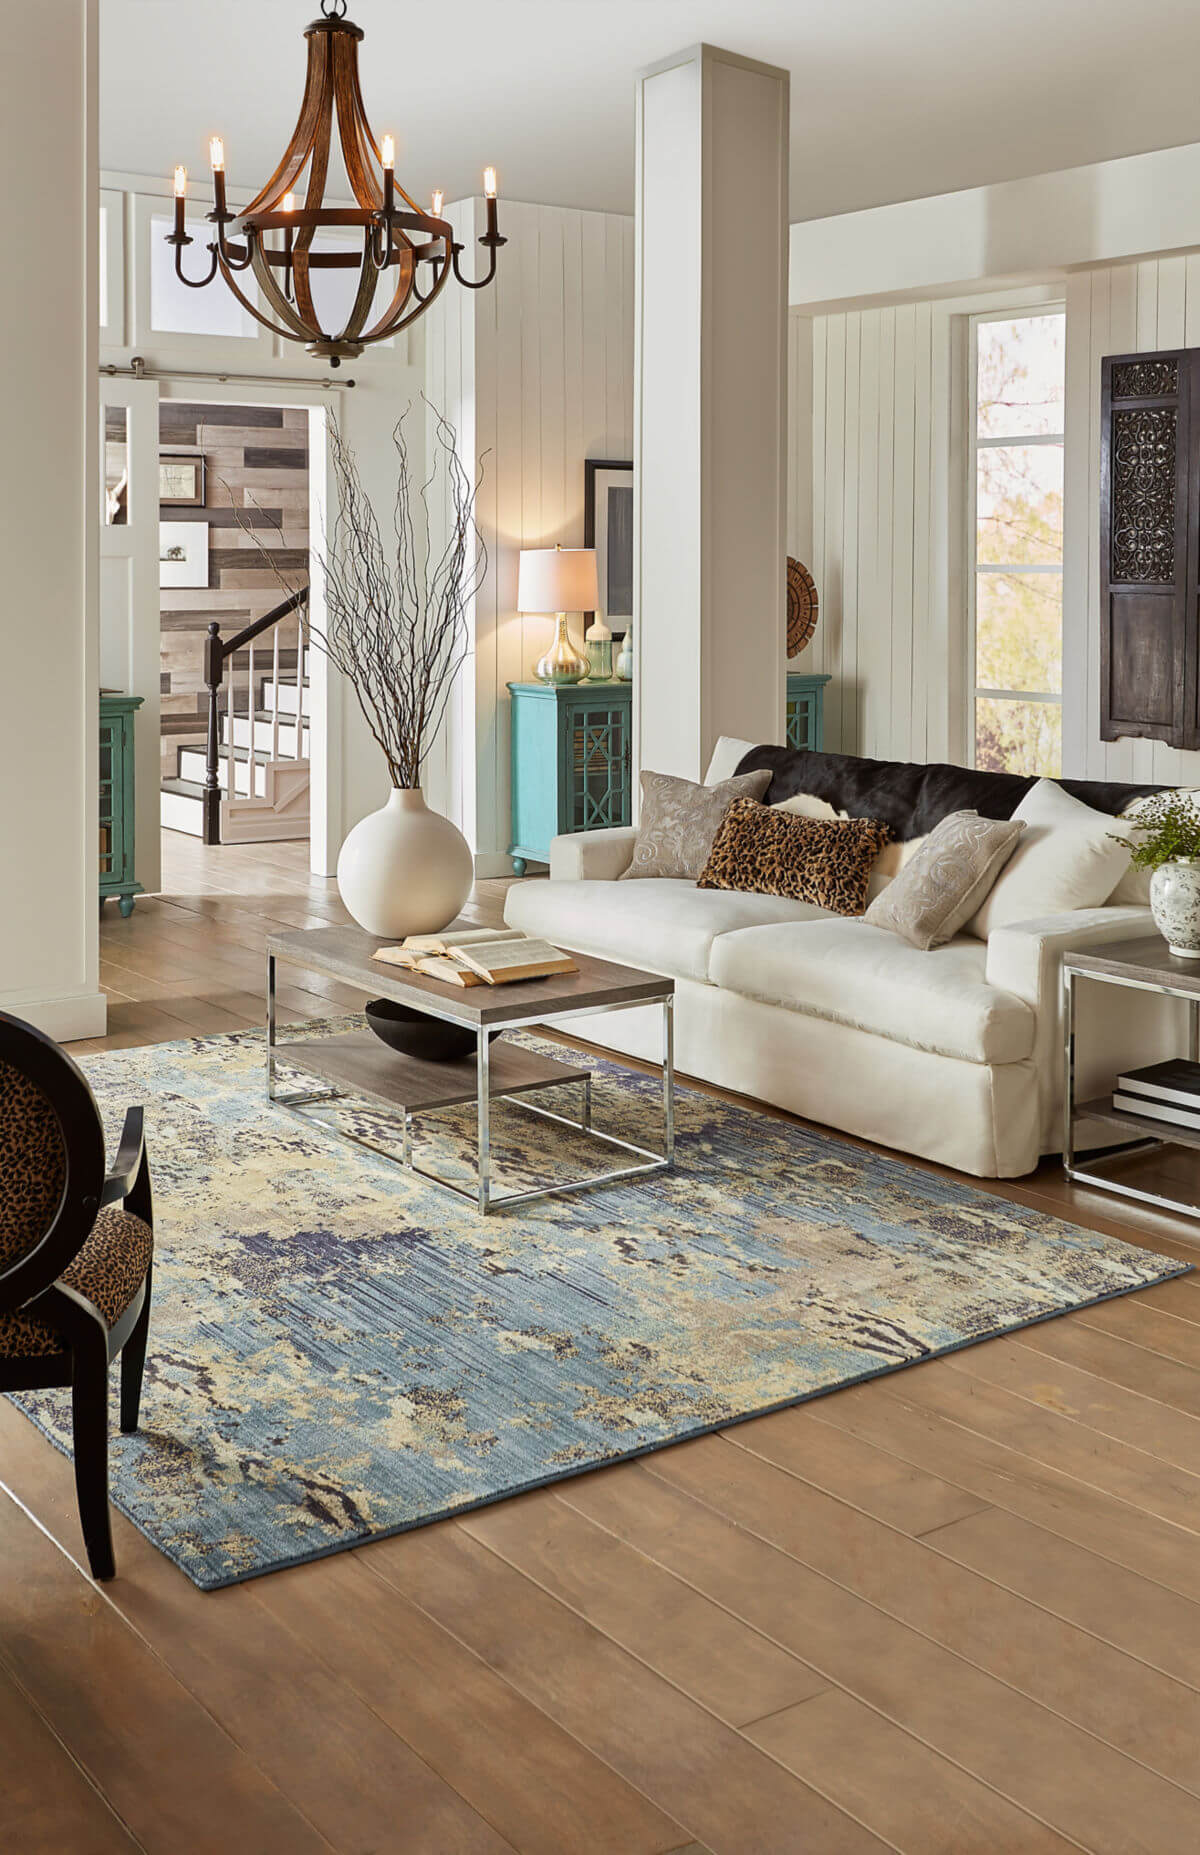 Aera Rug in living room | Shans Carpets And Fine Flooring Inc